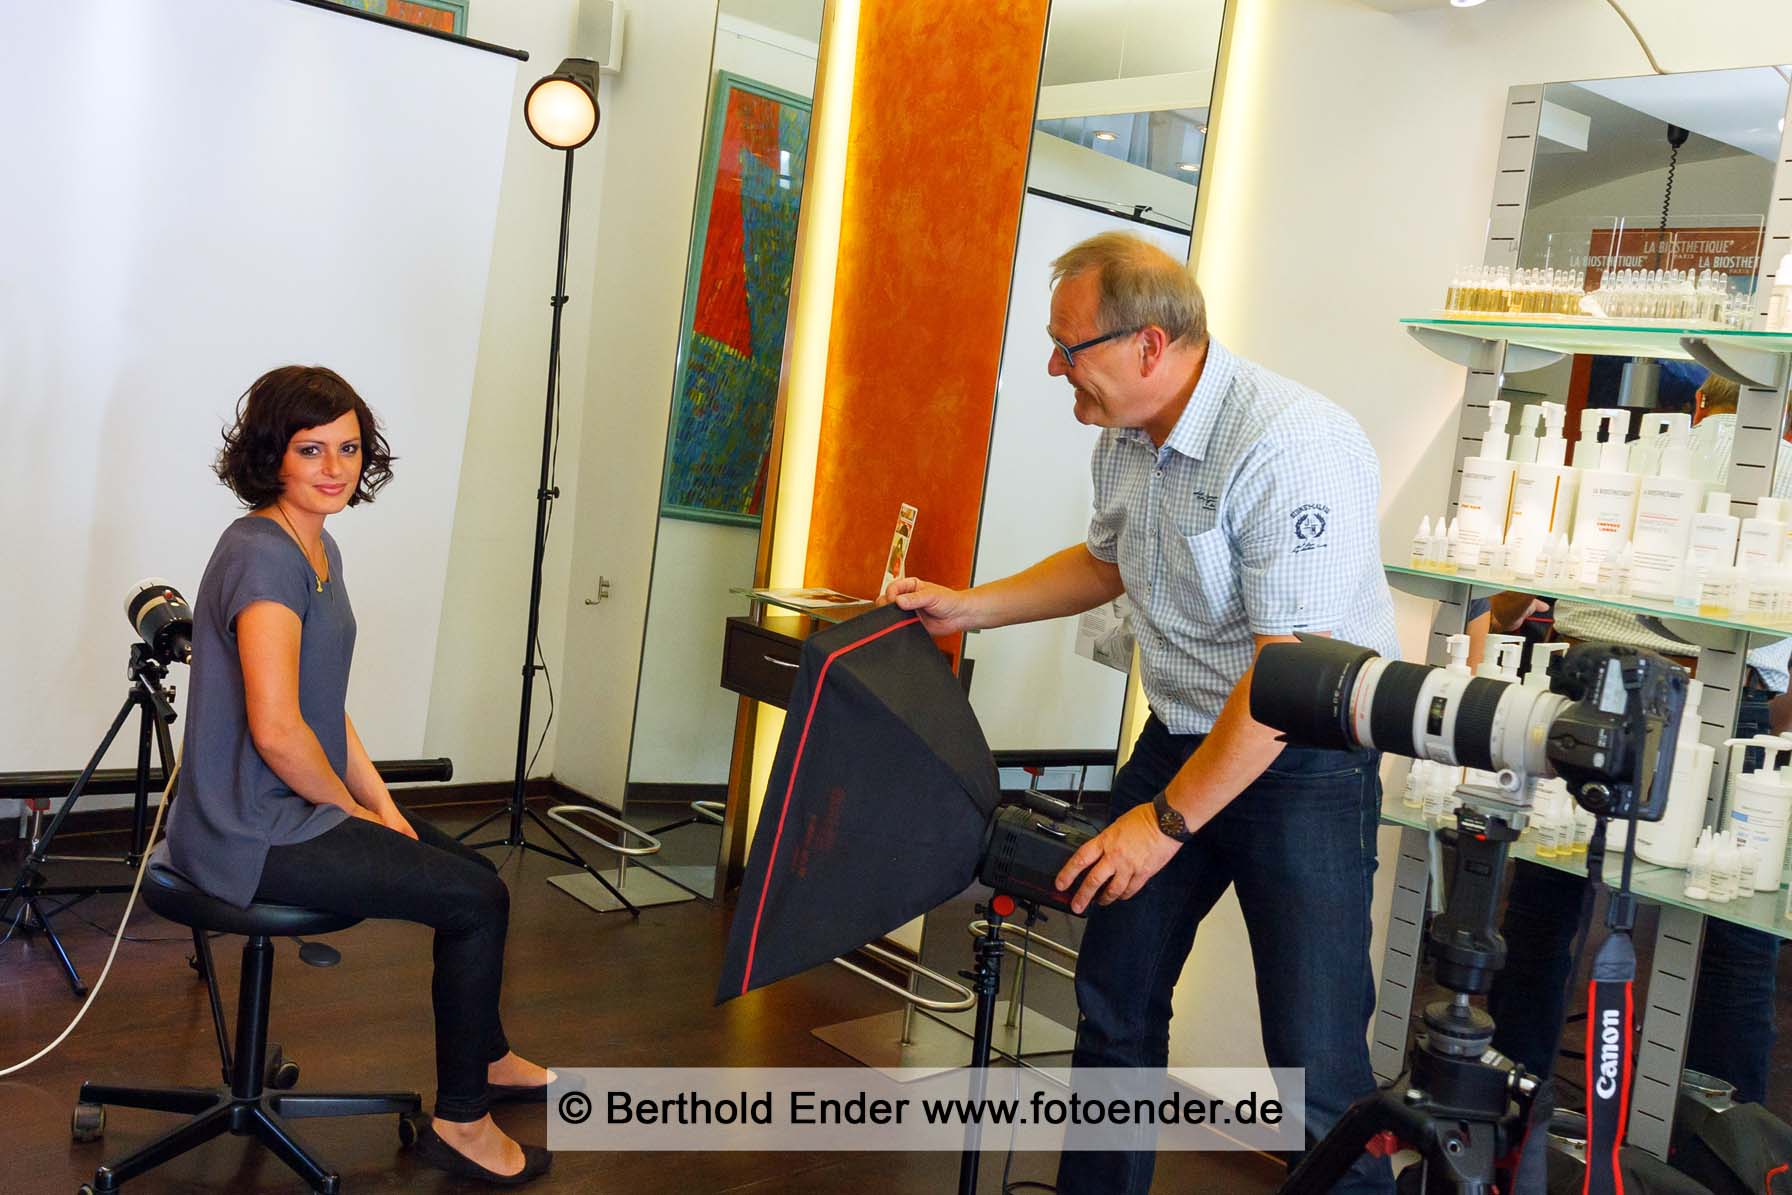 Teamfotos mit mobilem Fotostudio - Berthold Ender